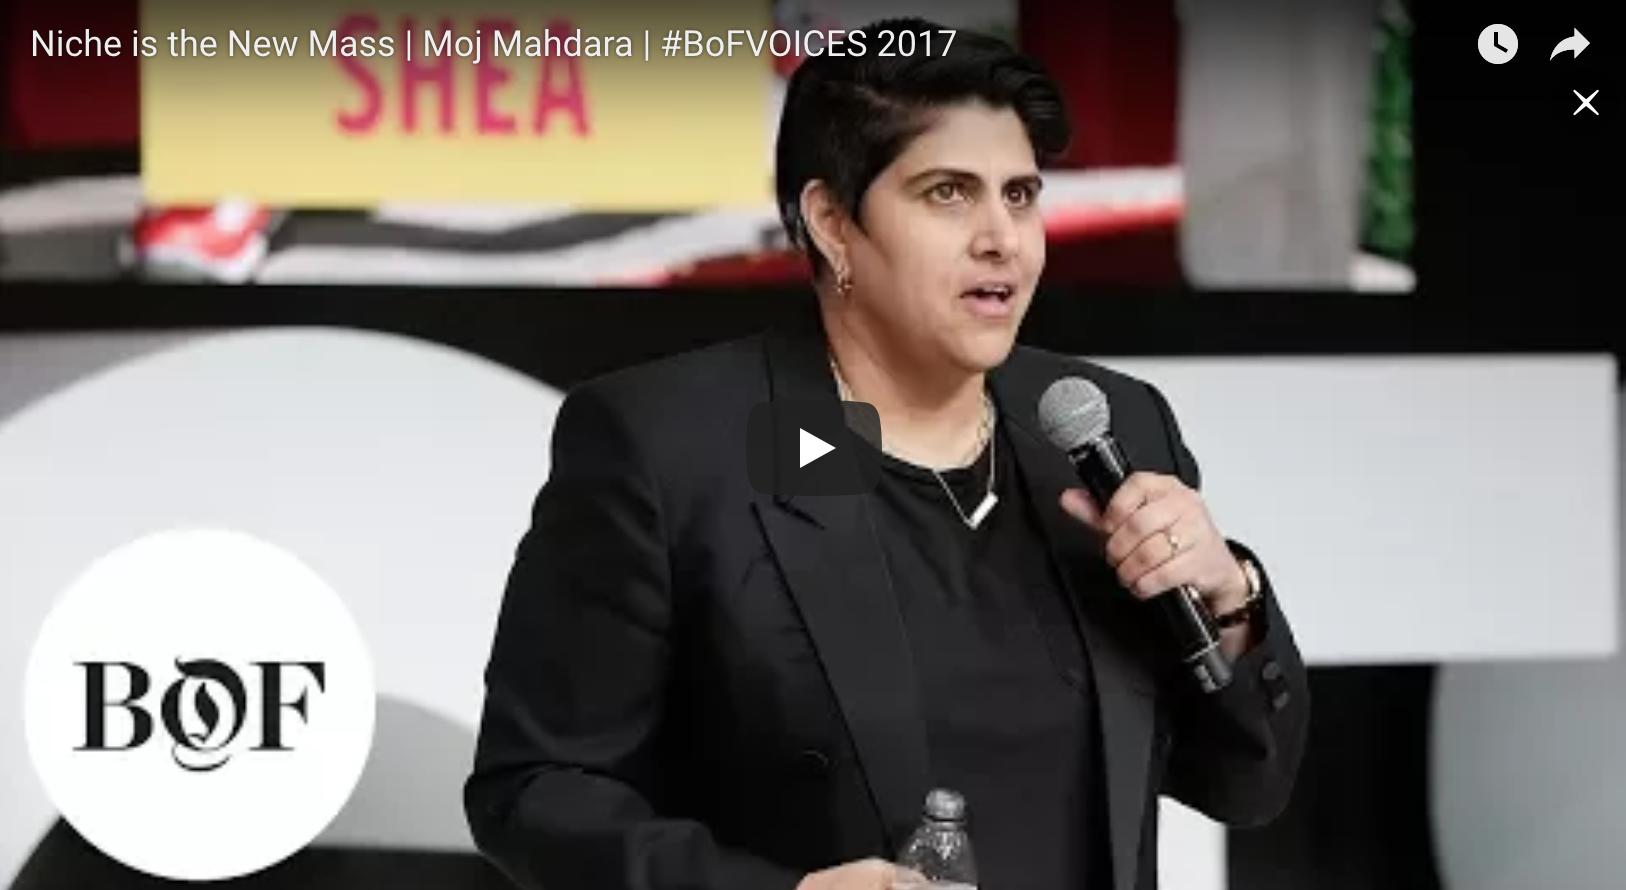 Moj Mahadara BoF Voices 2017